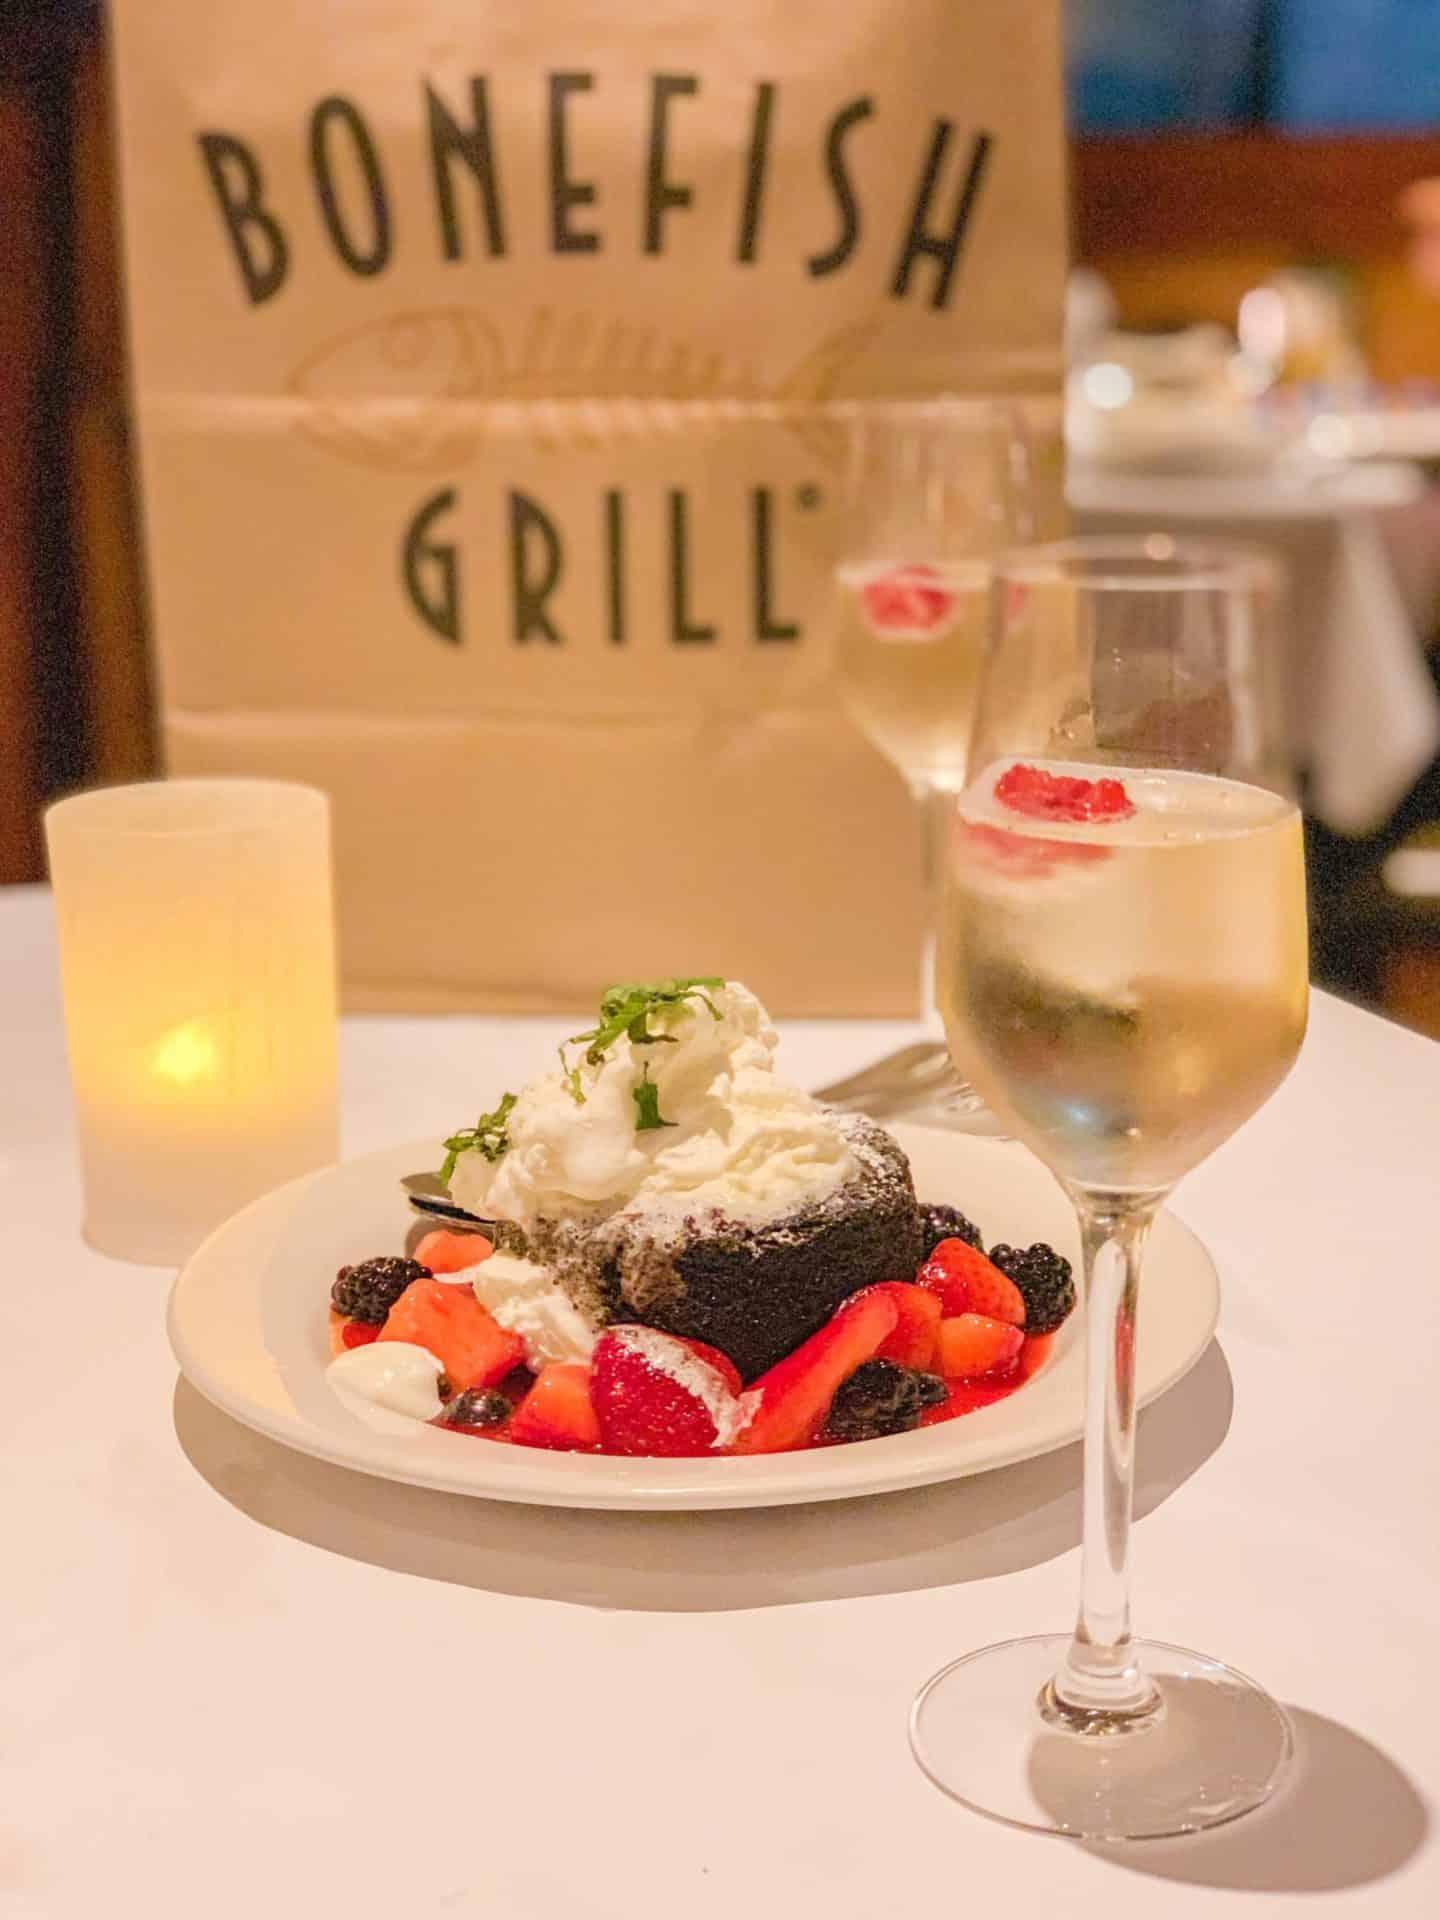 Our Valentines Dinner At Bonefish Grill Shaunda Necole